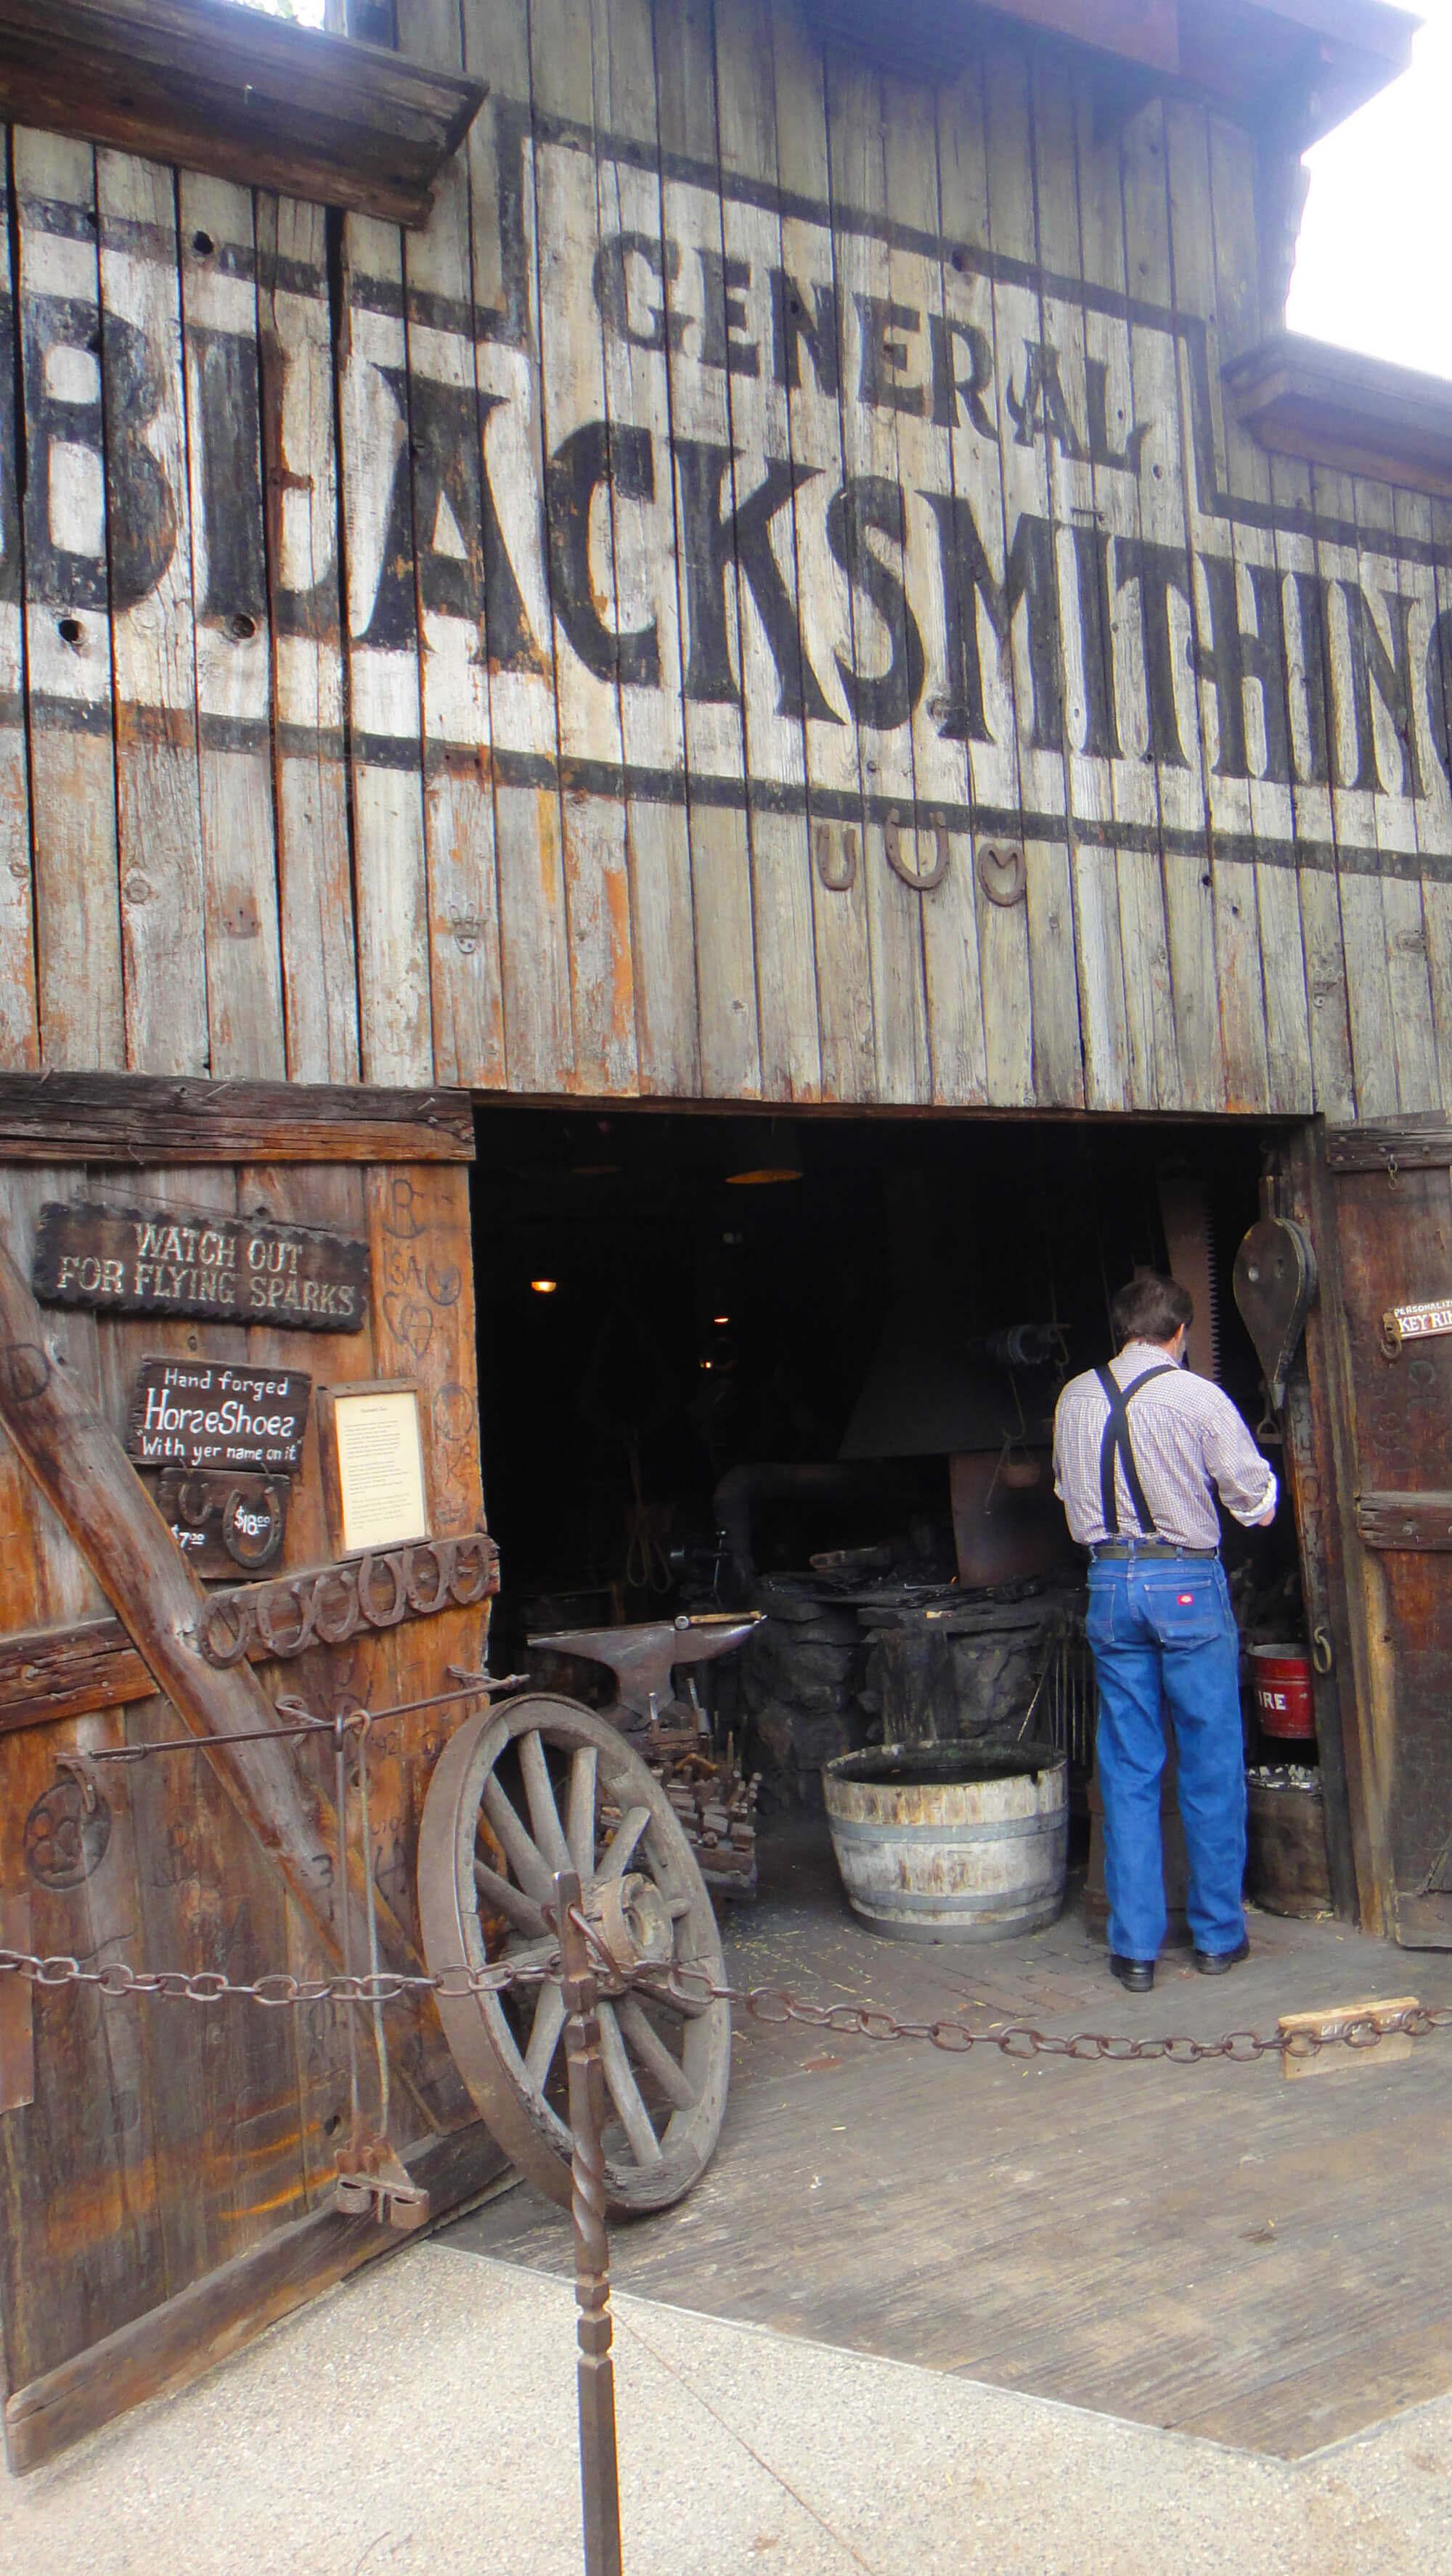 Not to miss Knott's Berry Farm - Blacksmith